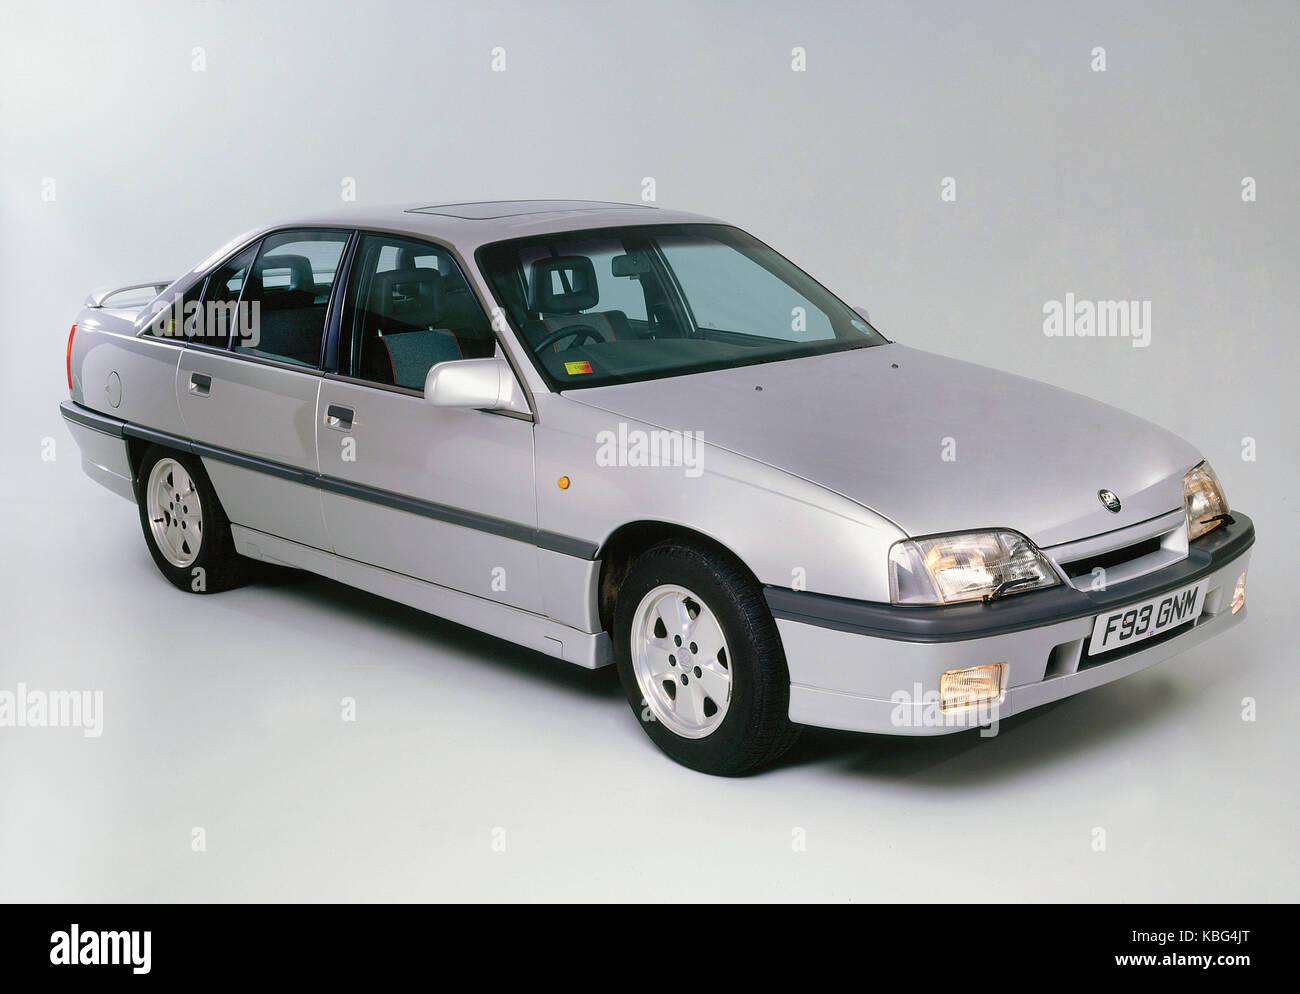 1989 Vauxhall Carlton 3.0 GSi Stockbild